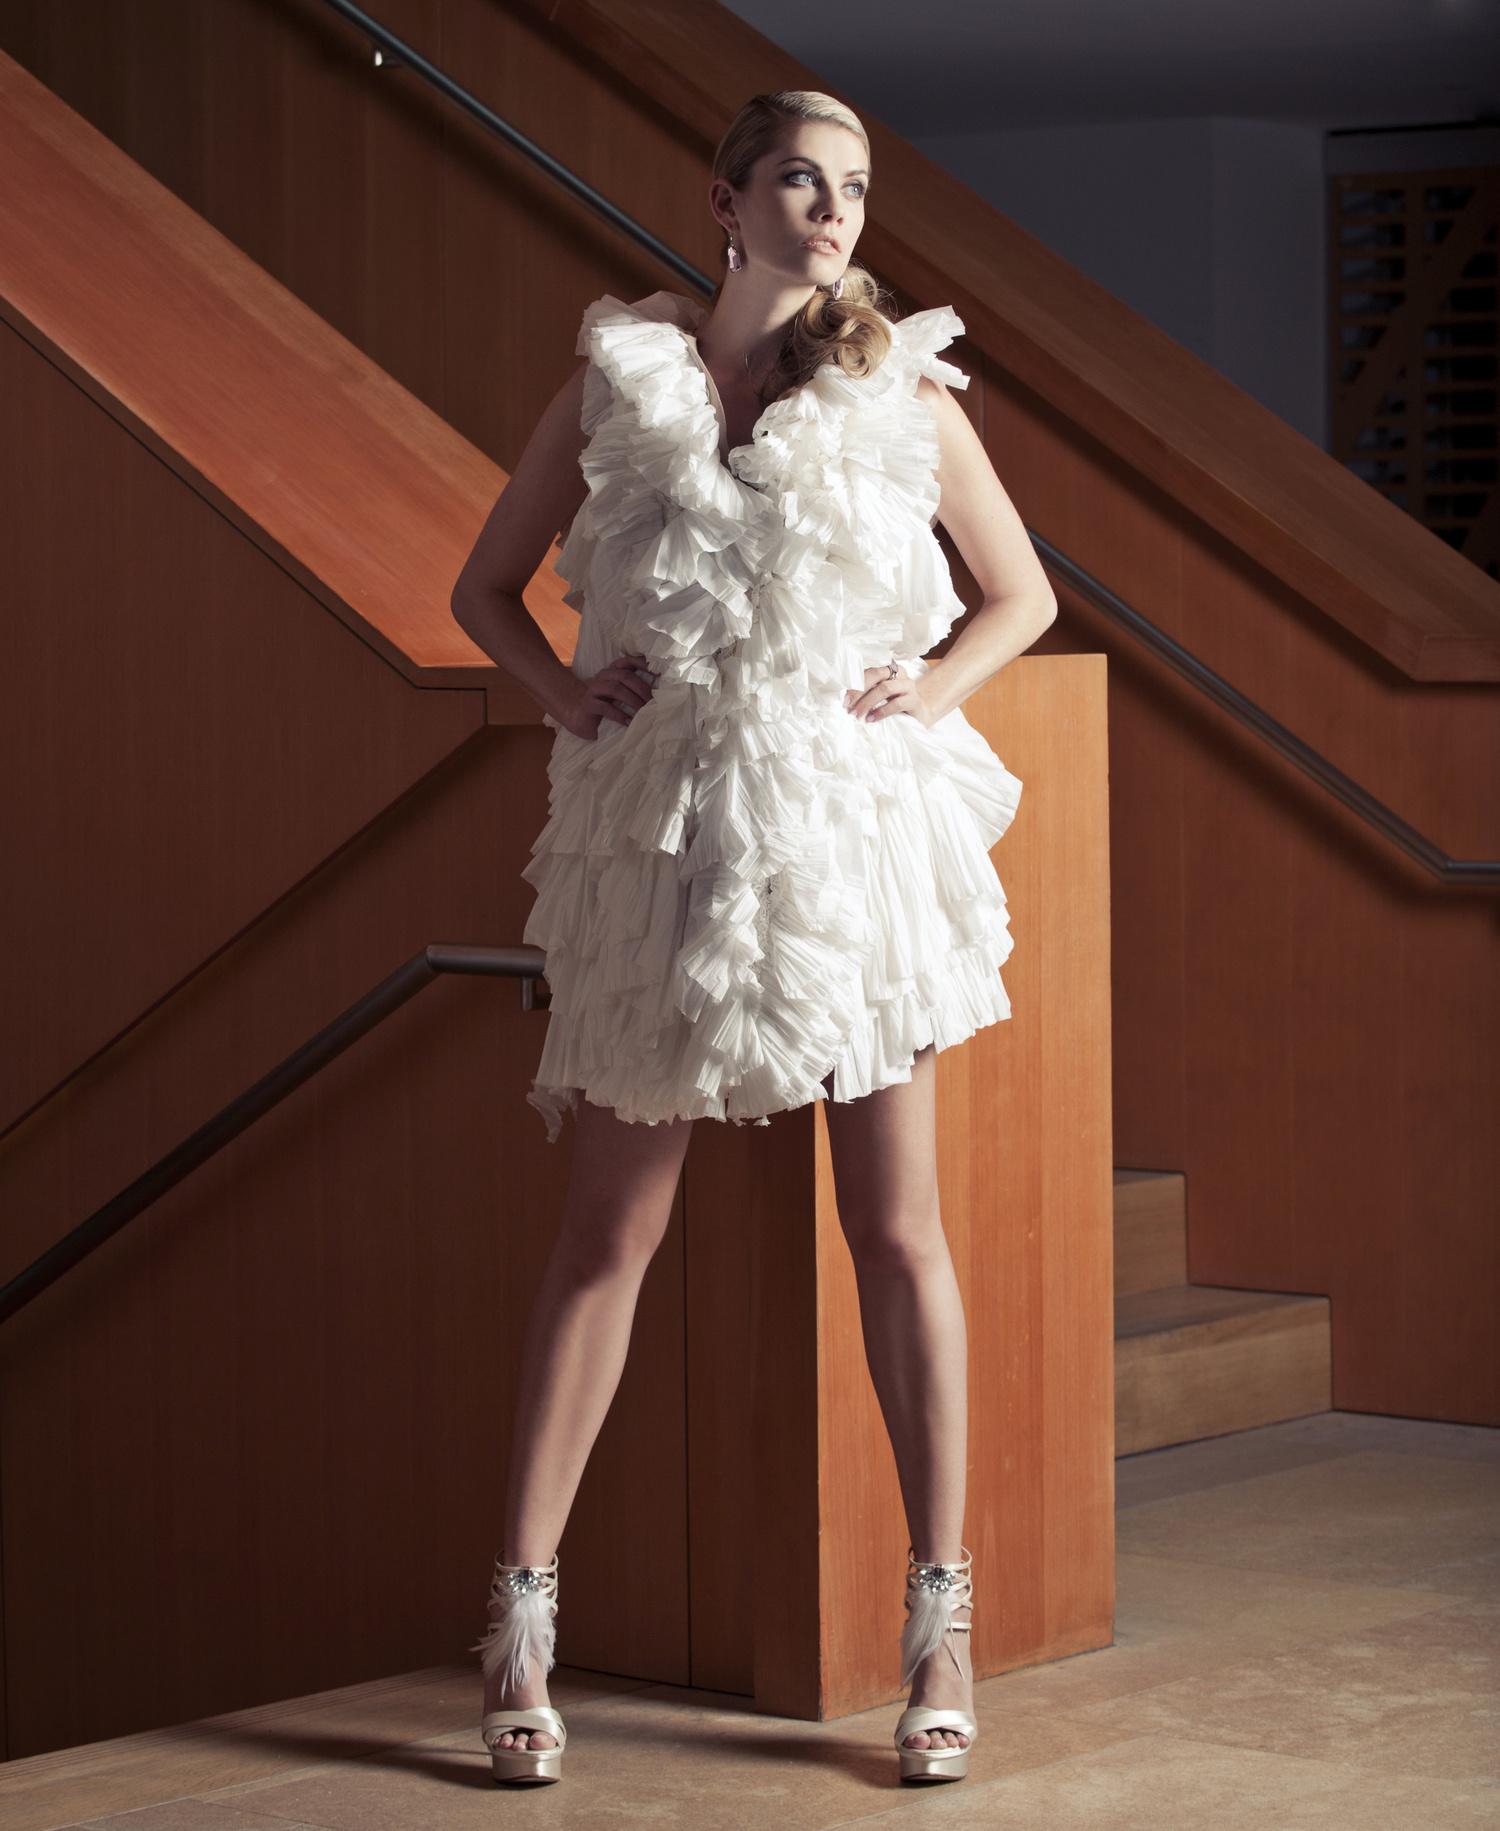 White-Cashmere-Collection-2013-Marie-Saint-Pierre-Photographer-Caitlin-Cronenberg.jpg